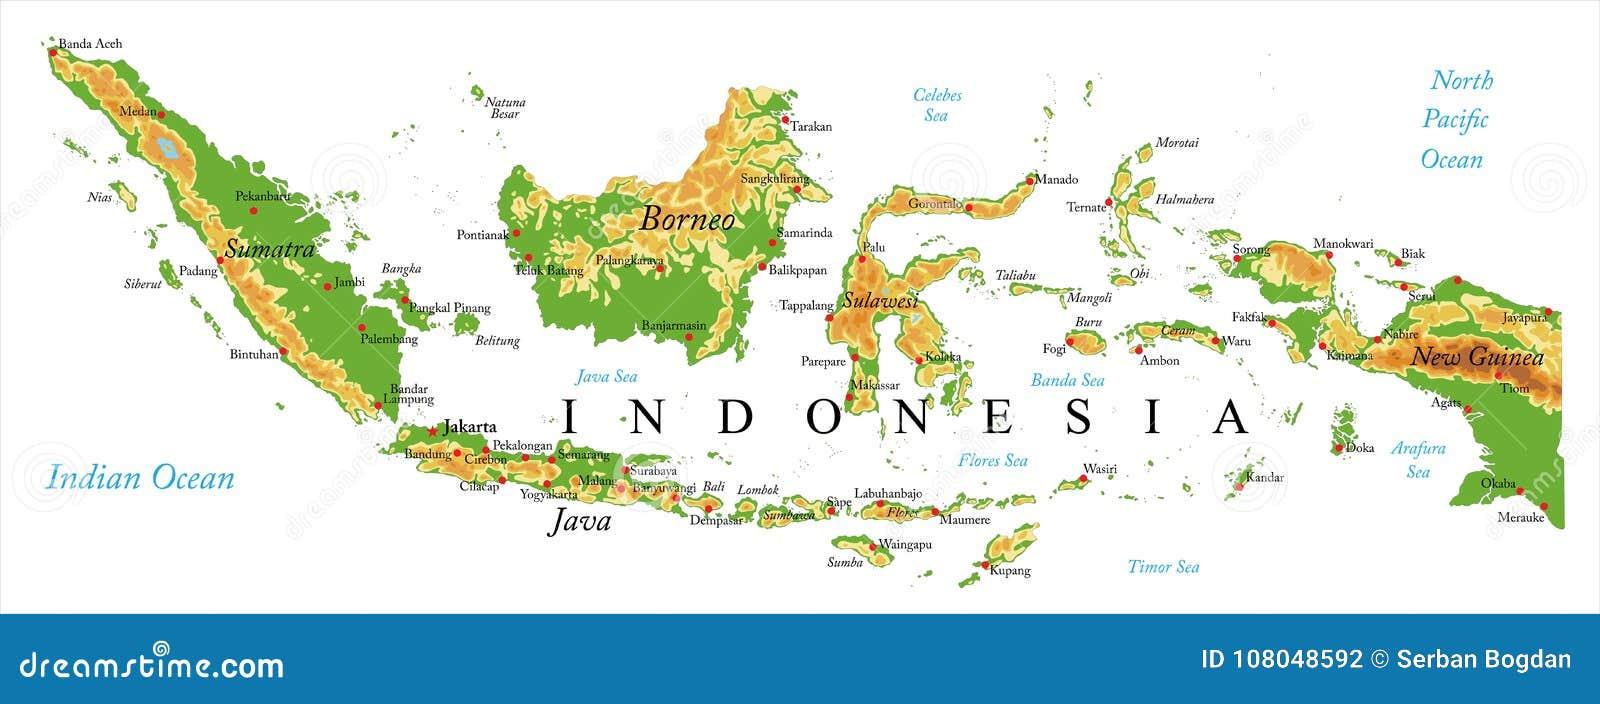 Cartina Bali Indonesia.Indonesia Map Relief Stock Illustrations 428 Indonesia Map Relief Stock Illustrations Vectors Clipart Dreamstime